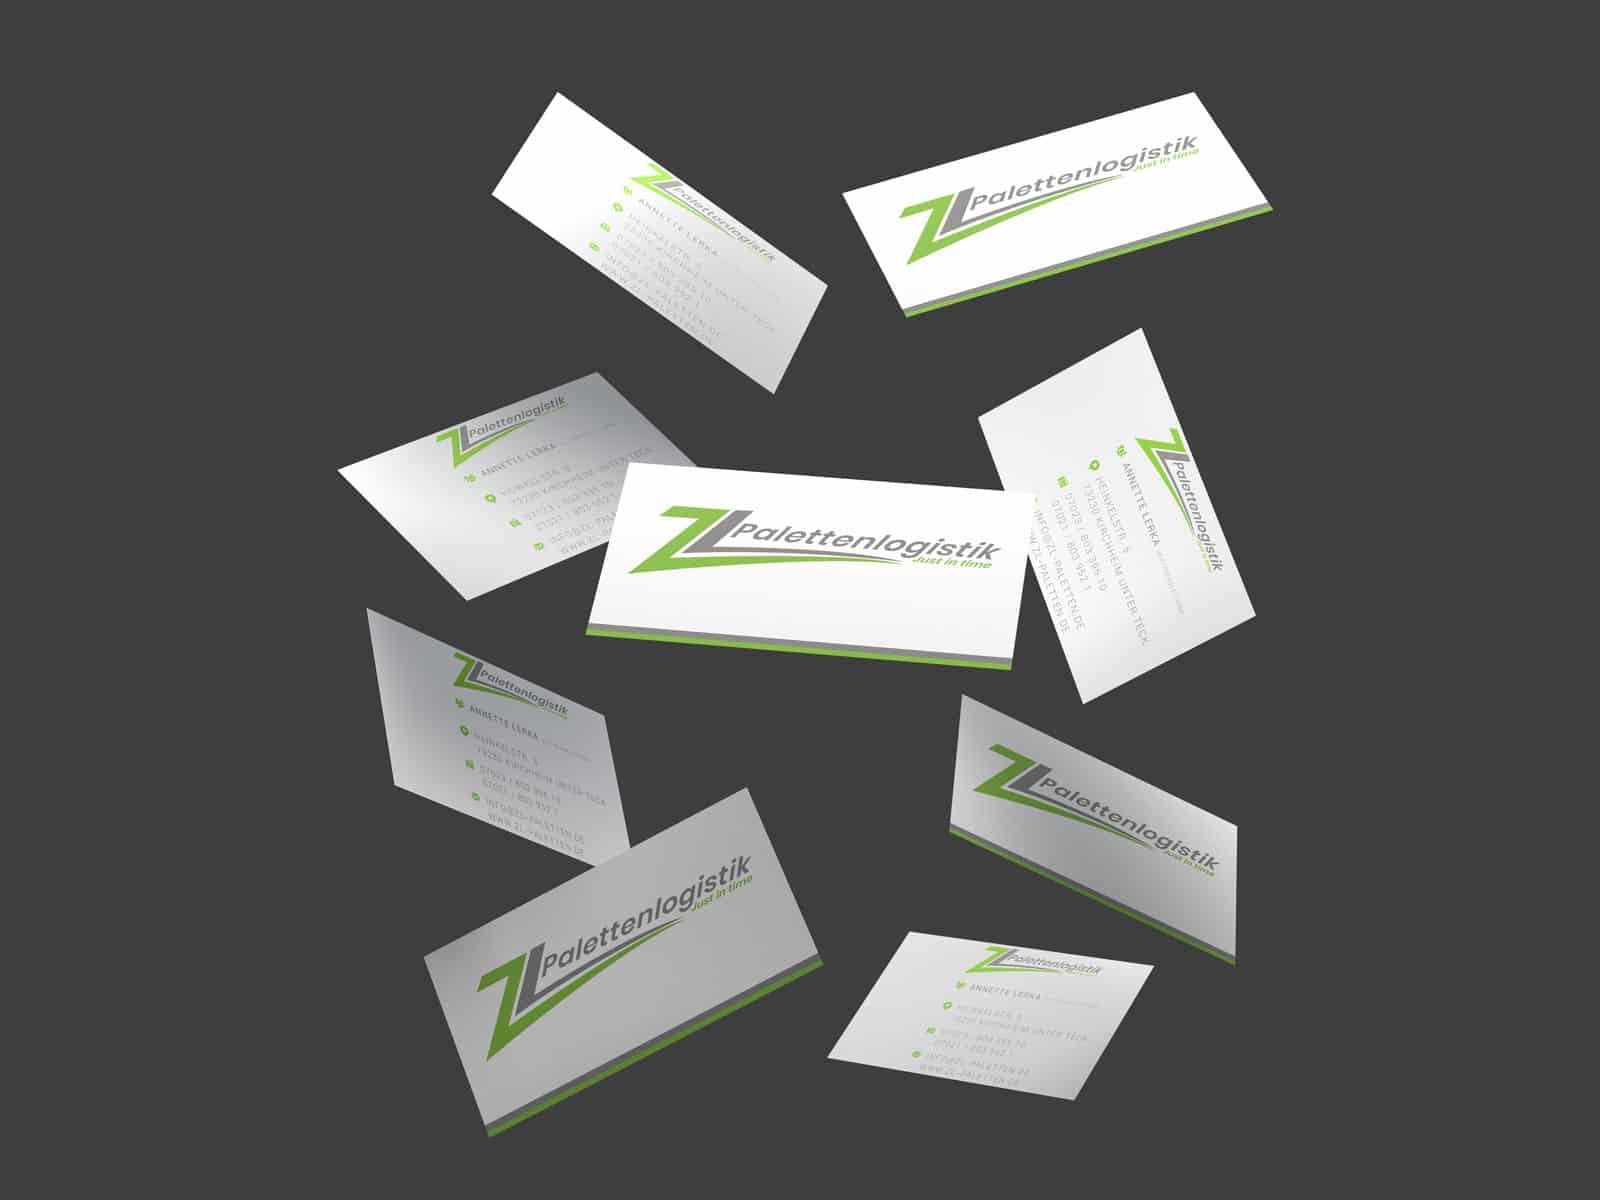 agentur-liebespixel-grafik-ZL-paletten-Visitenkarten